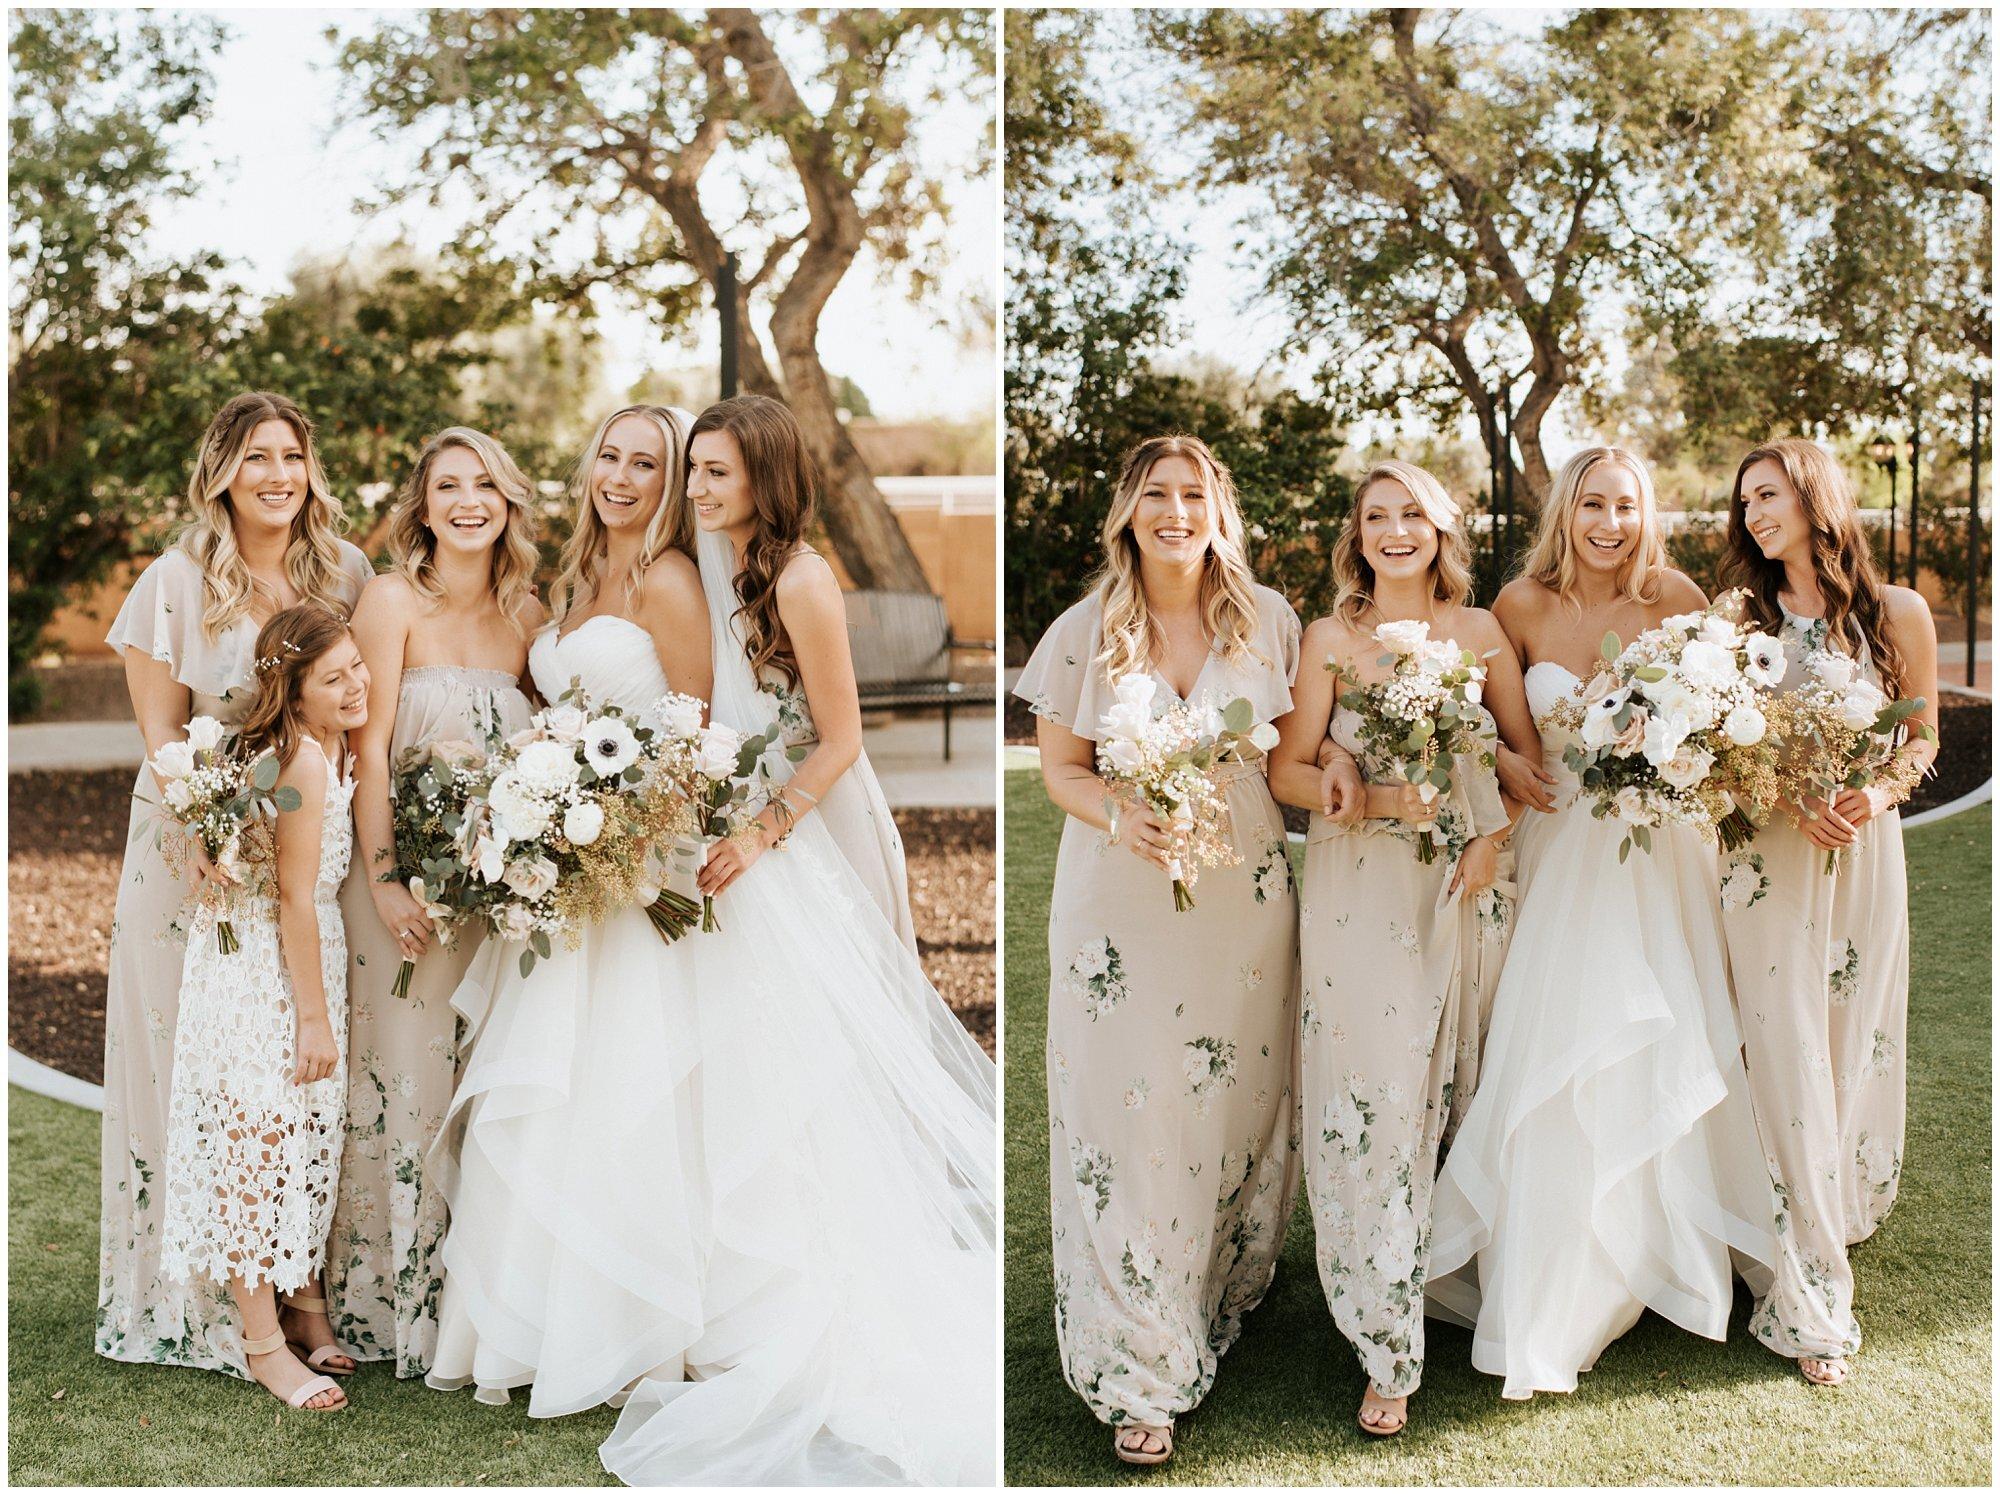 Wedgewood_Lindsay_Groves-Arizona-Wedding-Photographer-M+C_0021.jpg